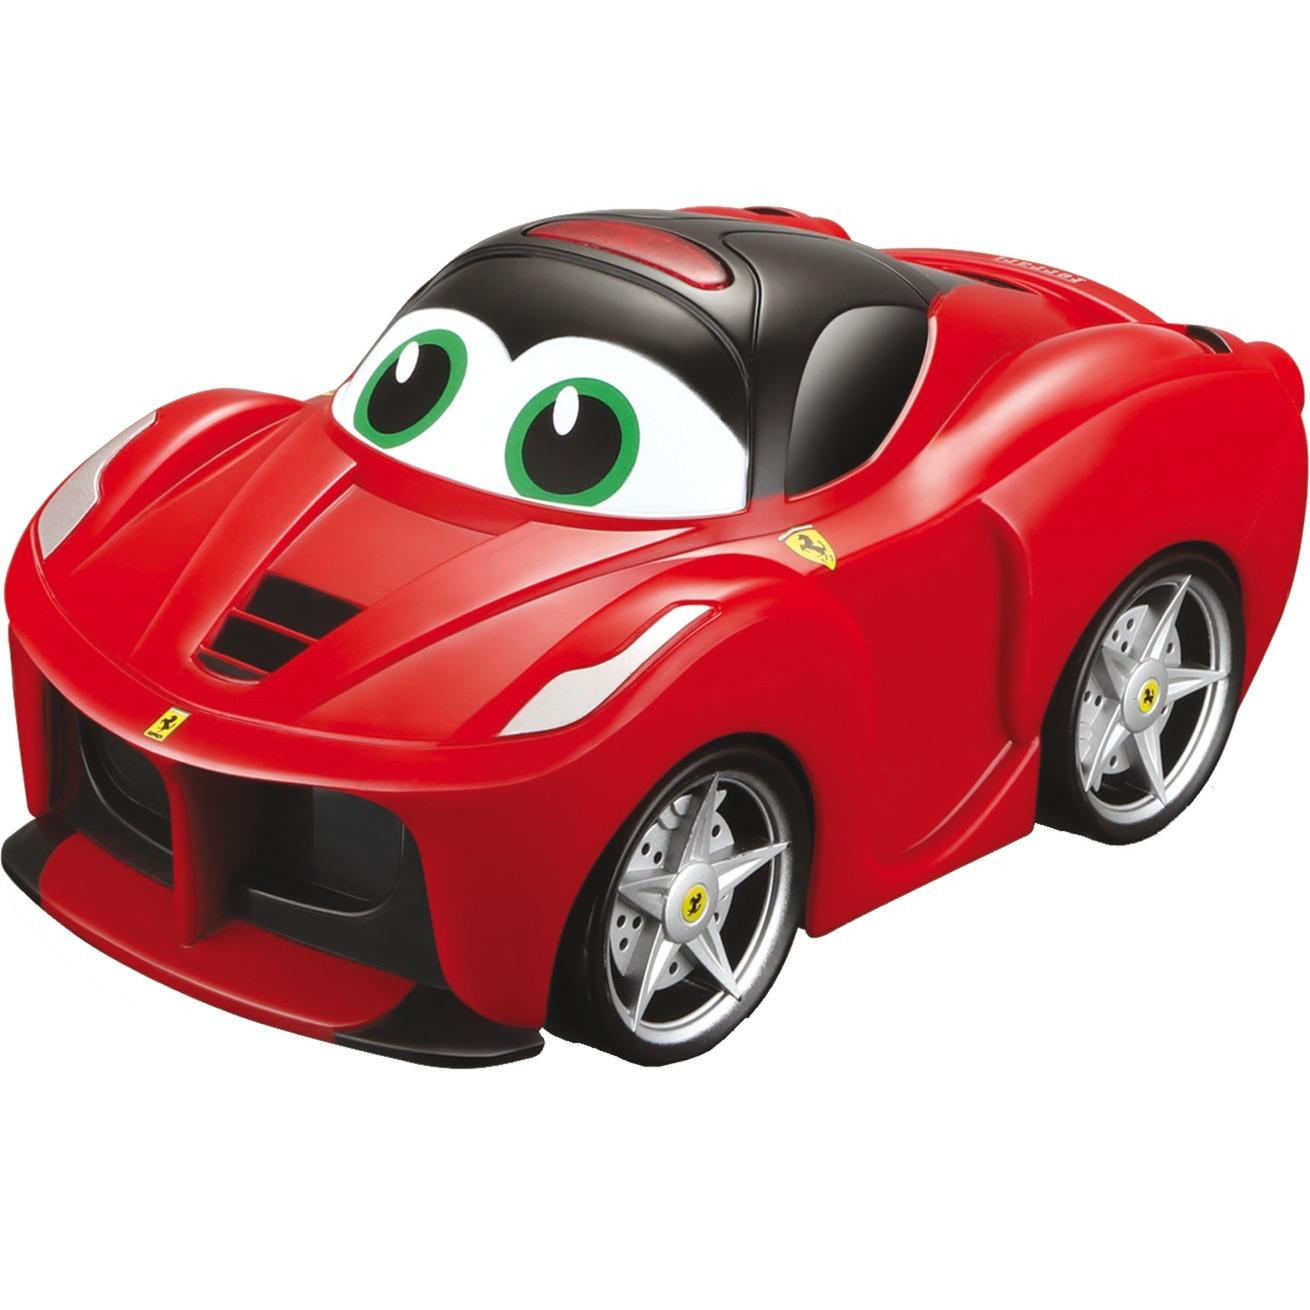 Image of BB Junior Ferrari Lil Drivers LaFerrari, RC